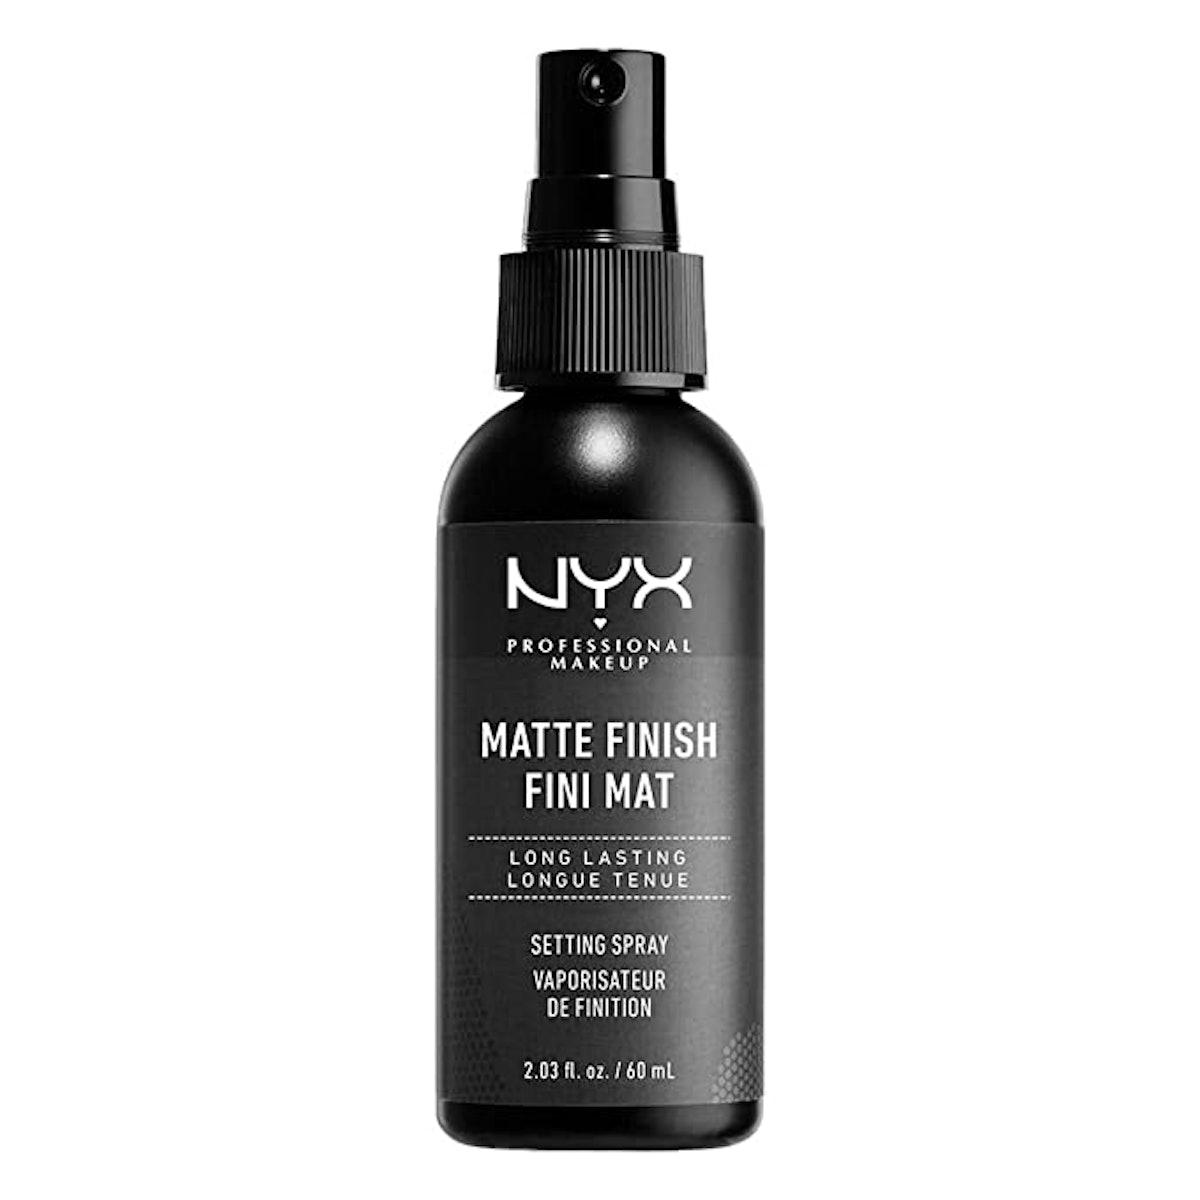 NYX Professional Makeup Matte Finish Makeup Setting Spray